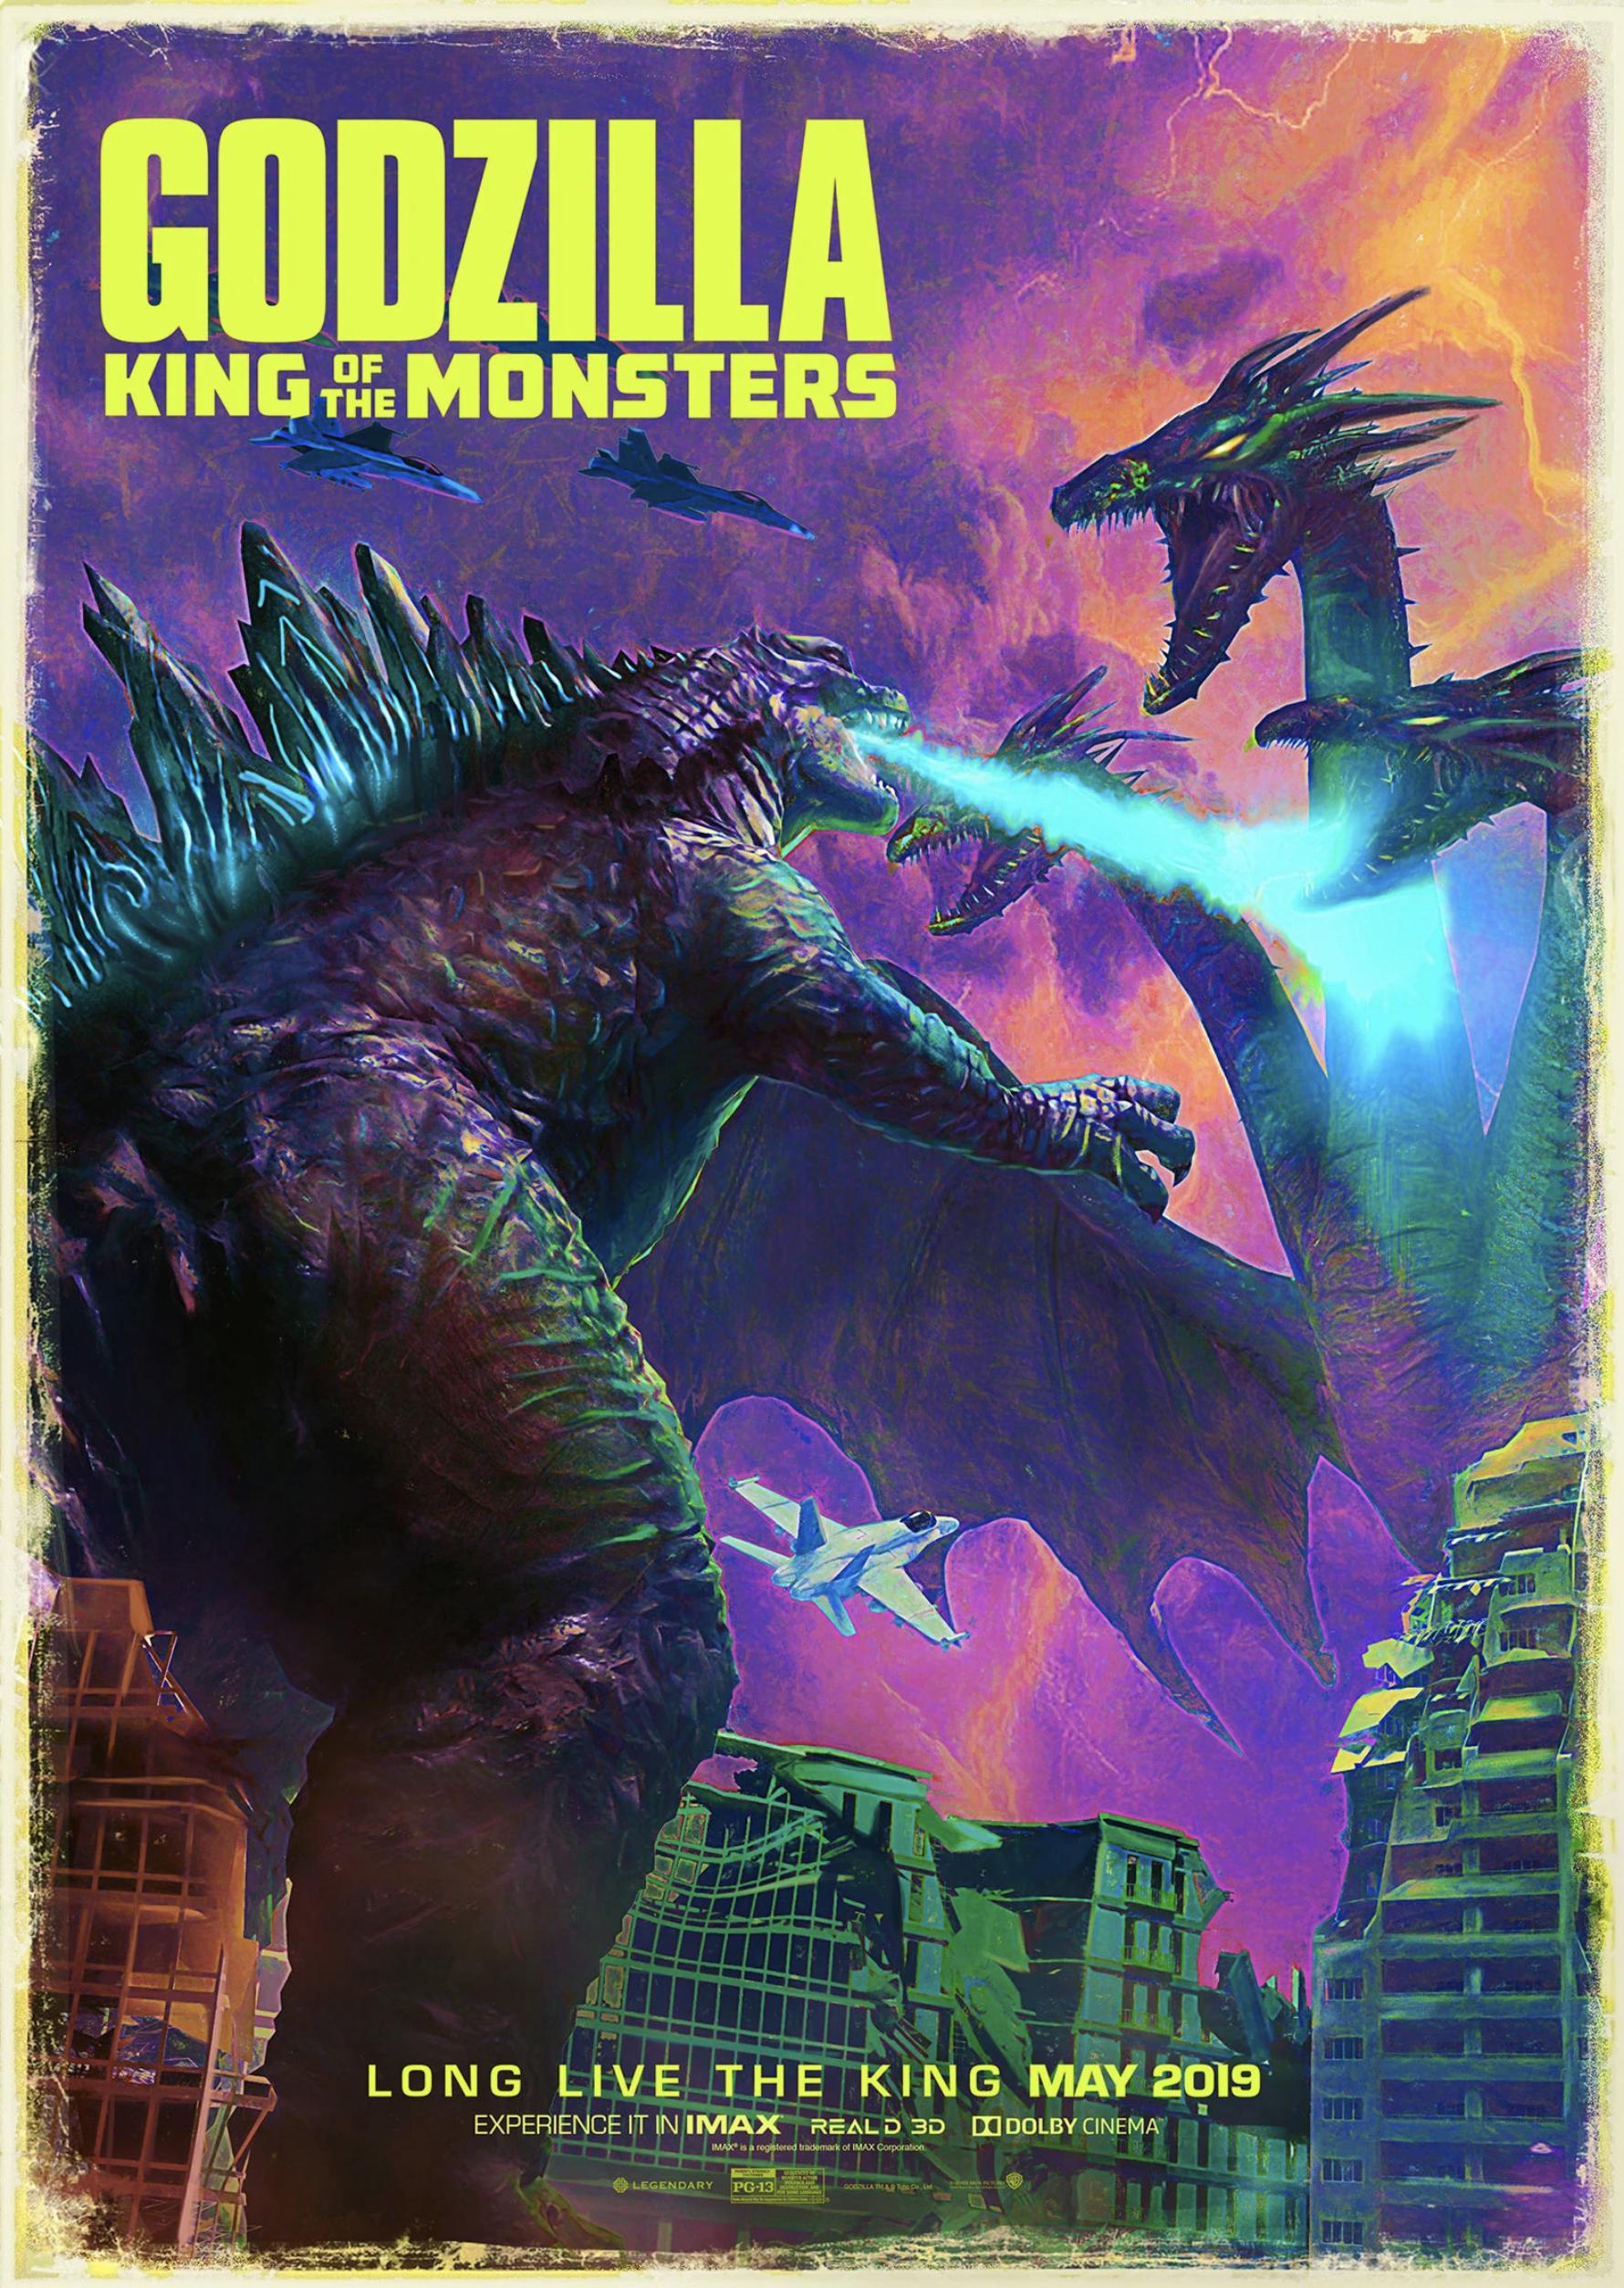 design entry winner 2 Chris Ramirez movie poster godzilla fan art